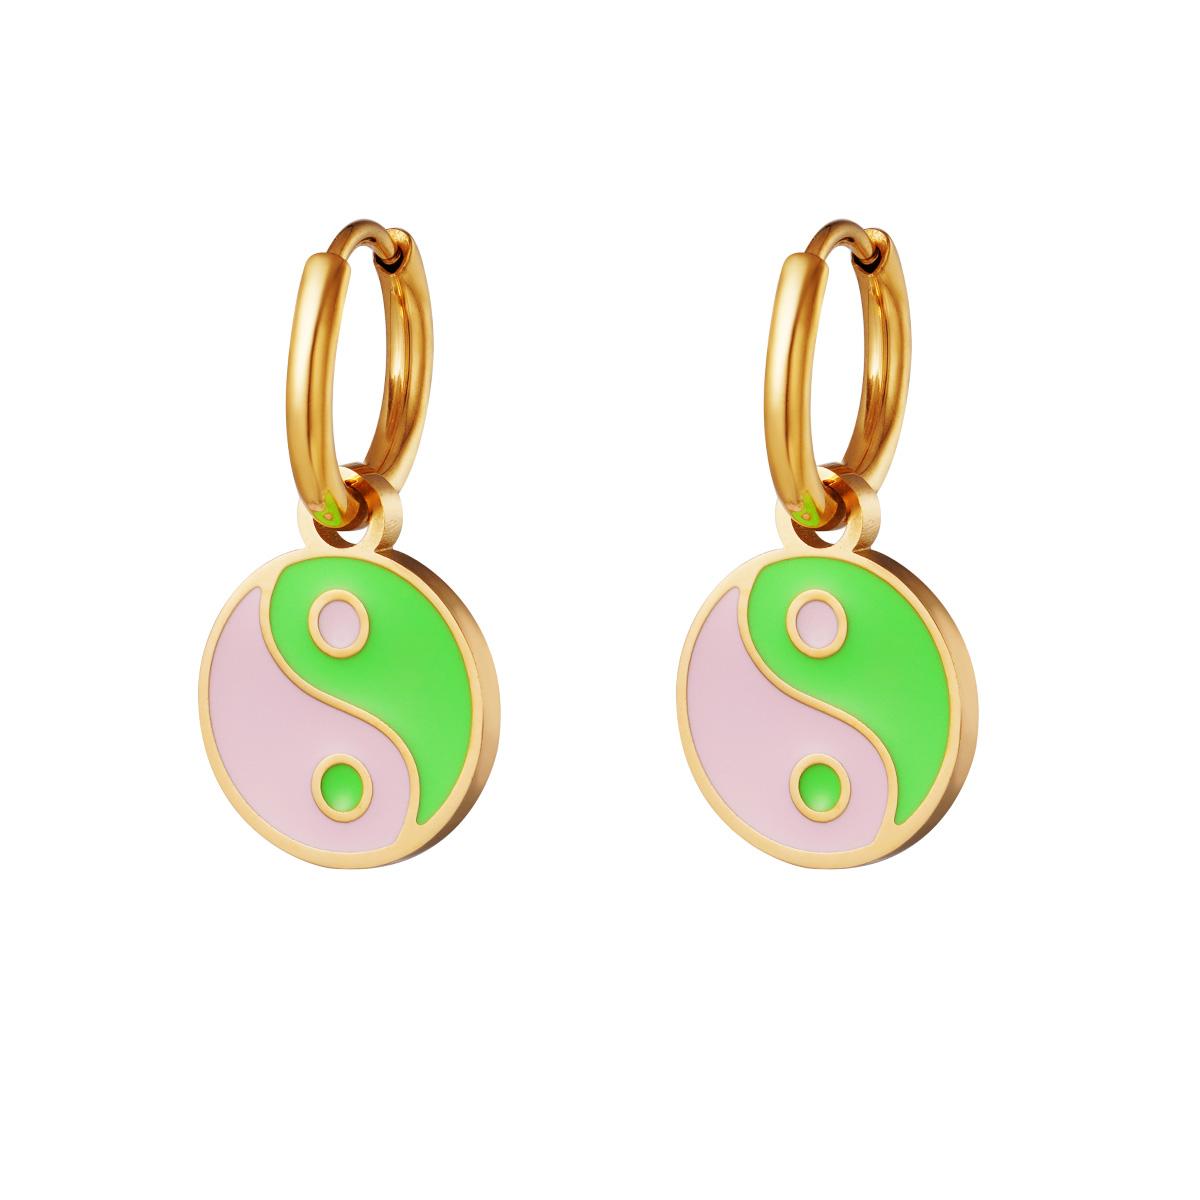 Boucles d'oreilles en acier inoxydable Yin Yang